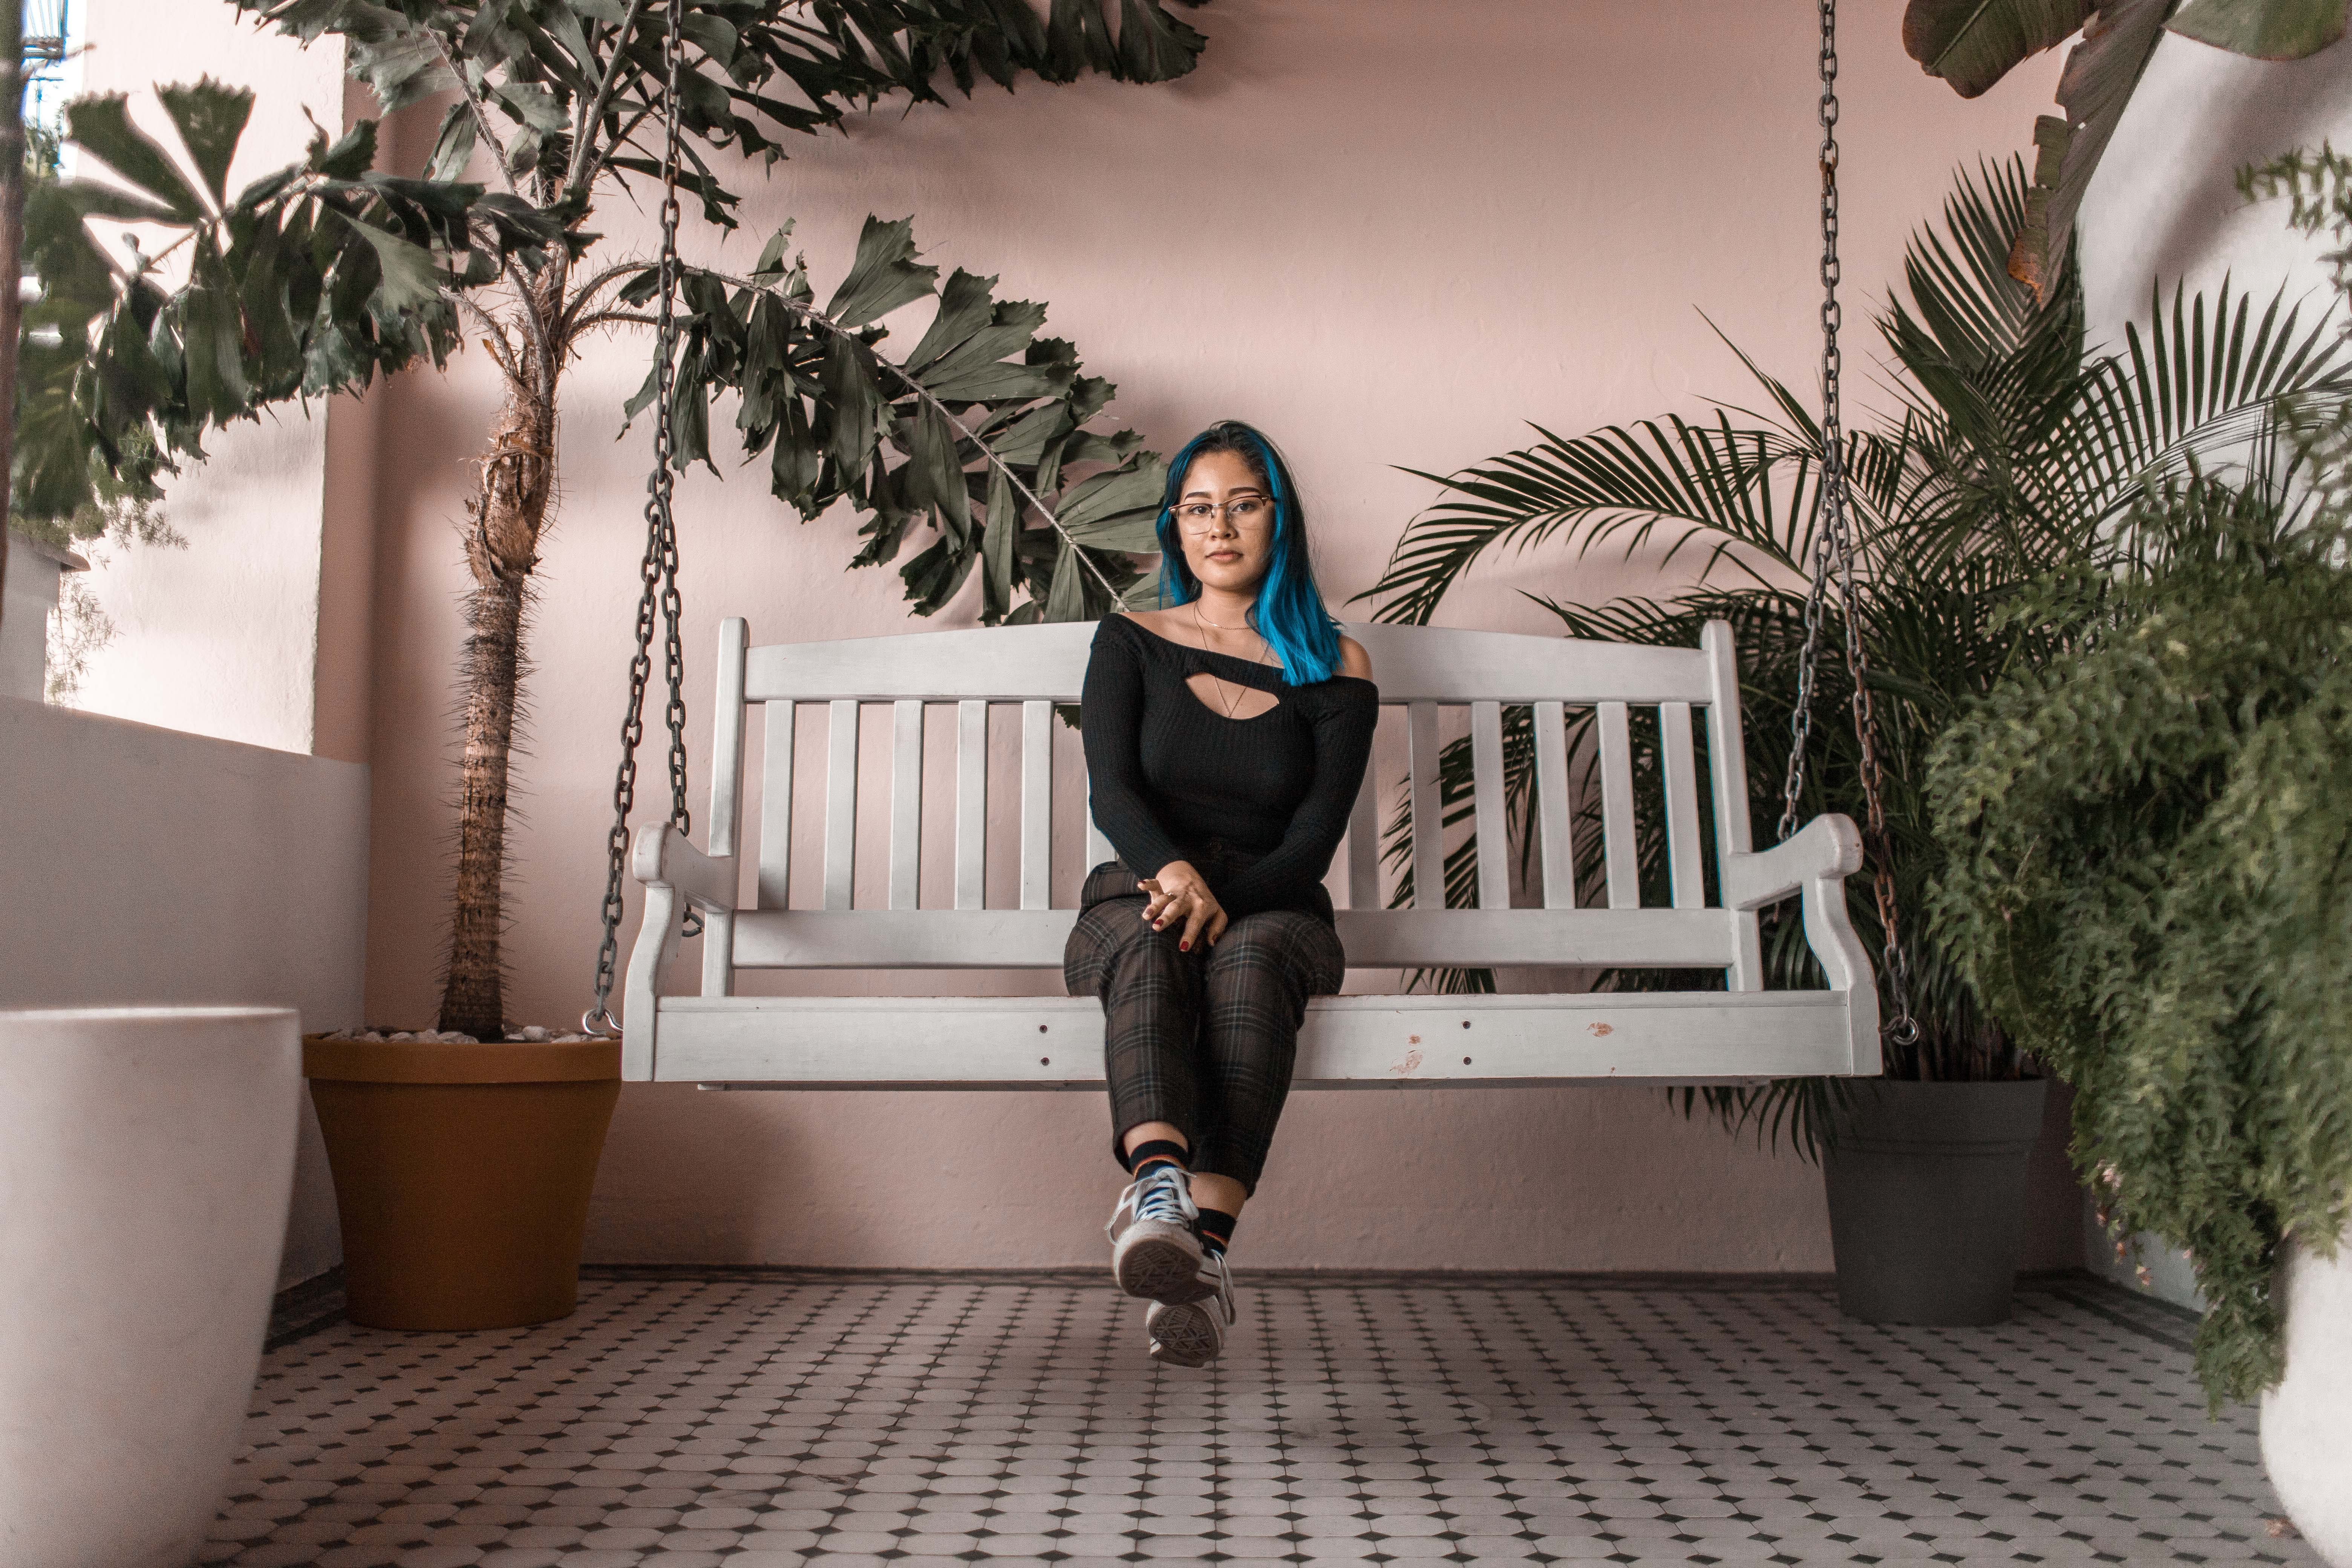 Woman Sitting On Swing Bench